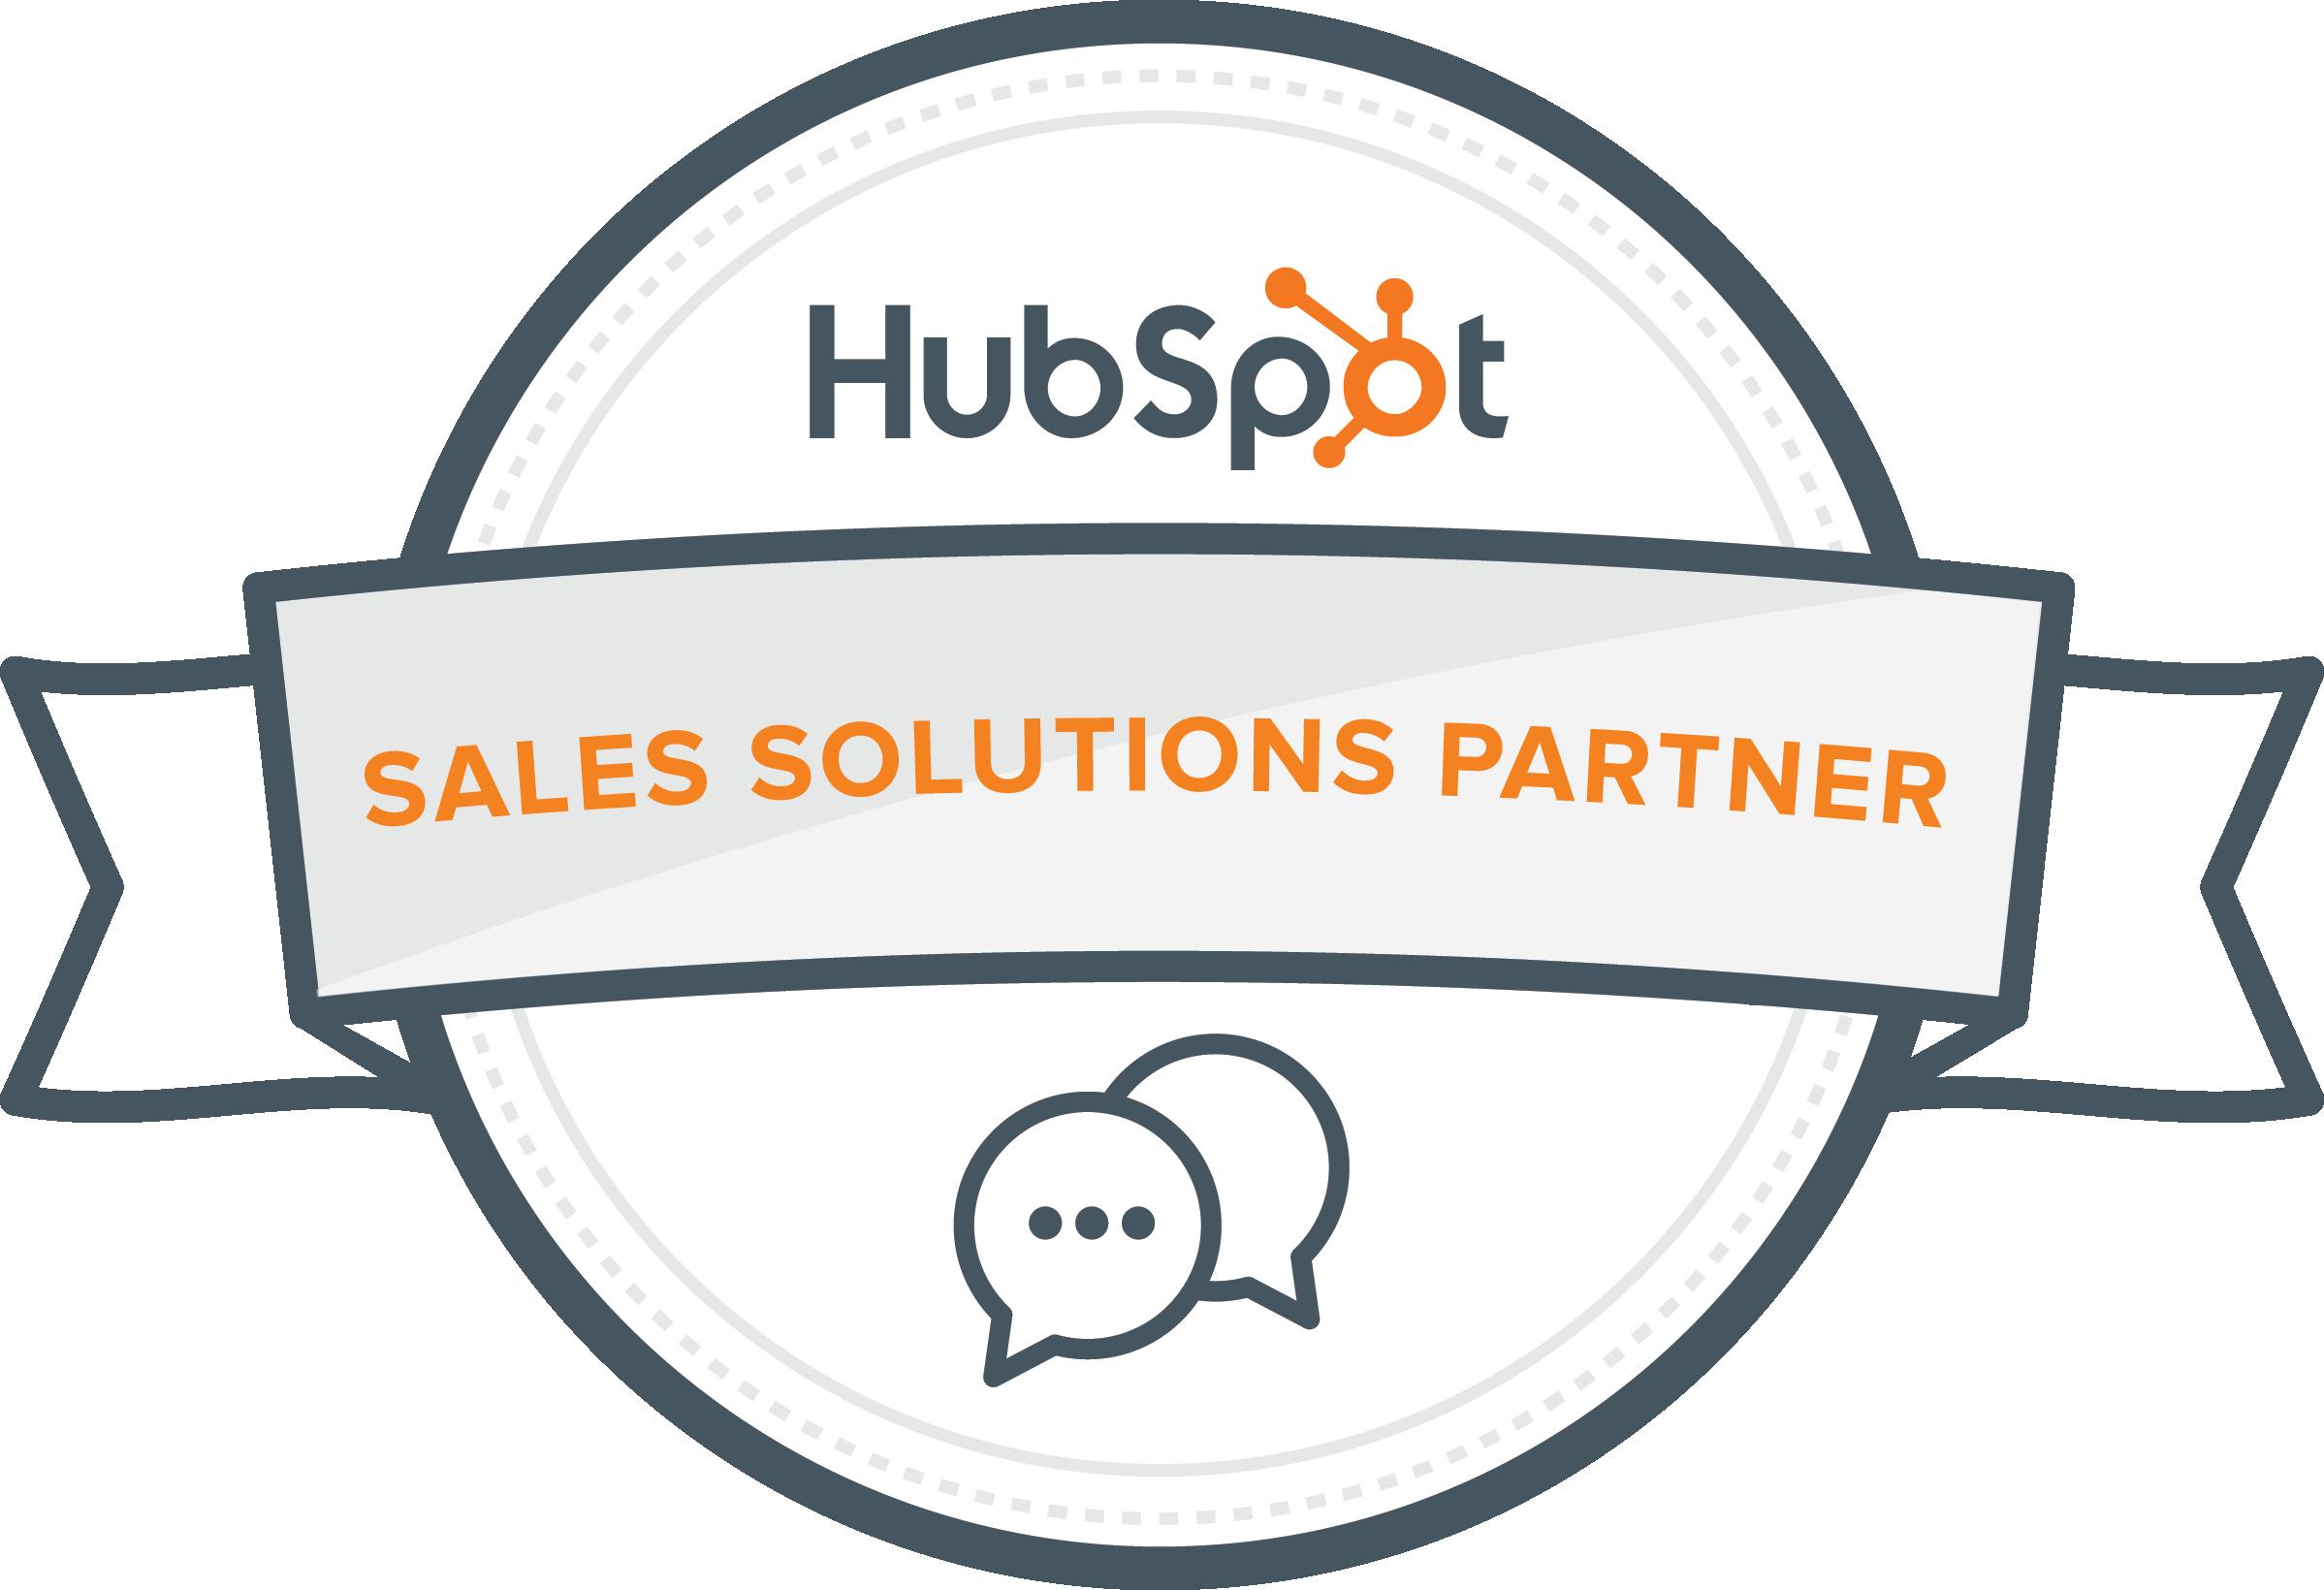 Online Marketing Business HubSpot solutions partner